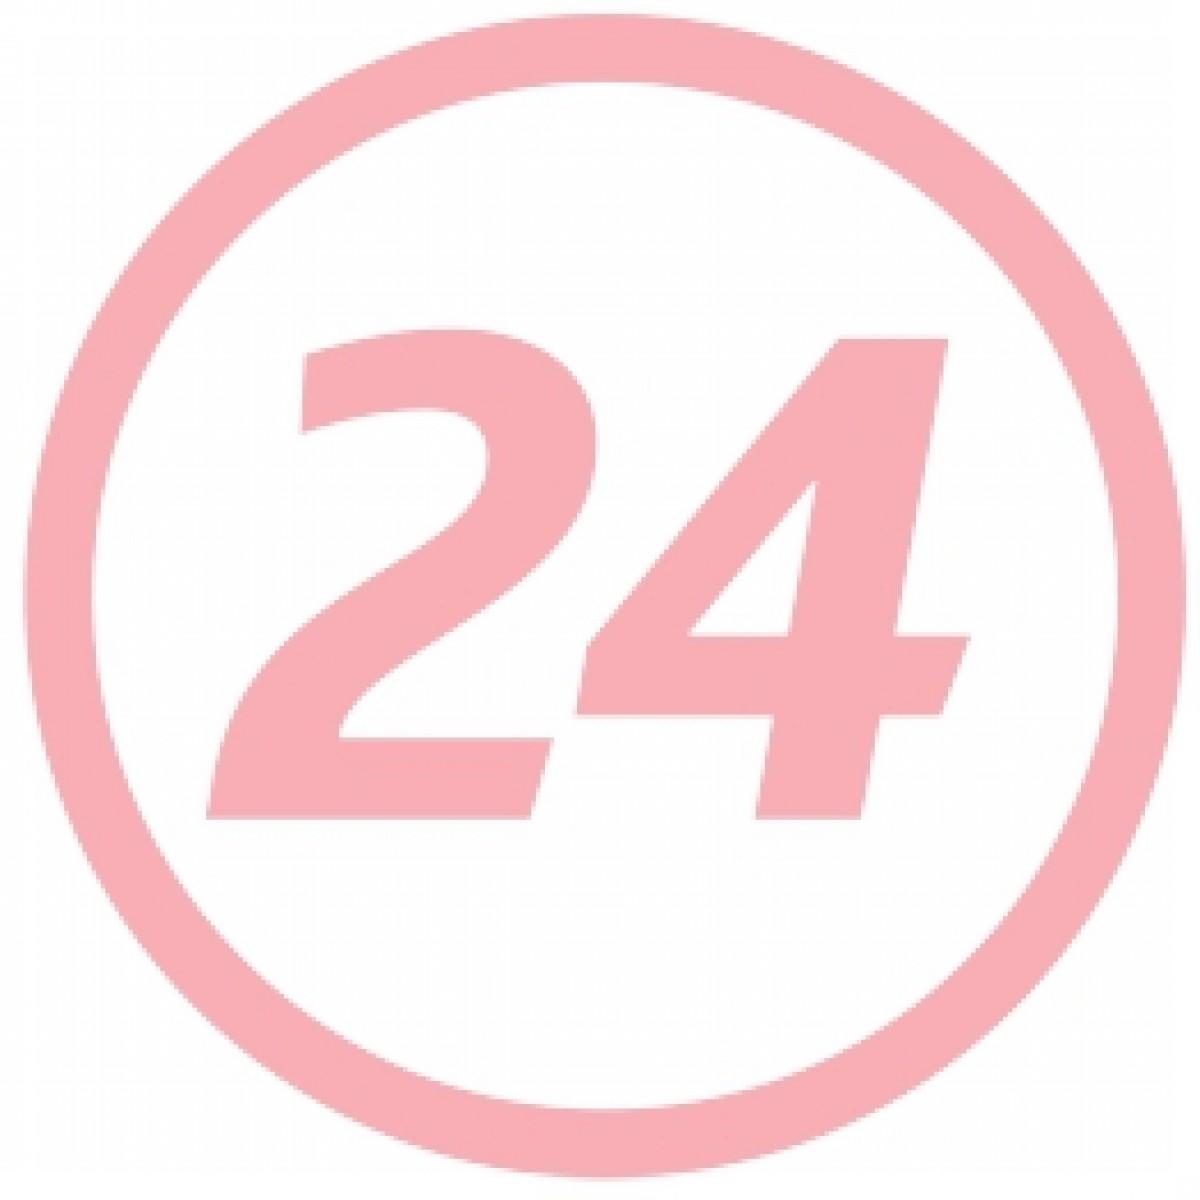 VICHY Liftactiv Flexilift Teint 25 Nude, Fond de Ten, 30ml